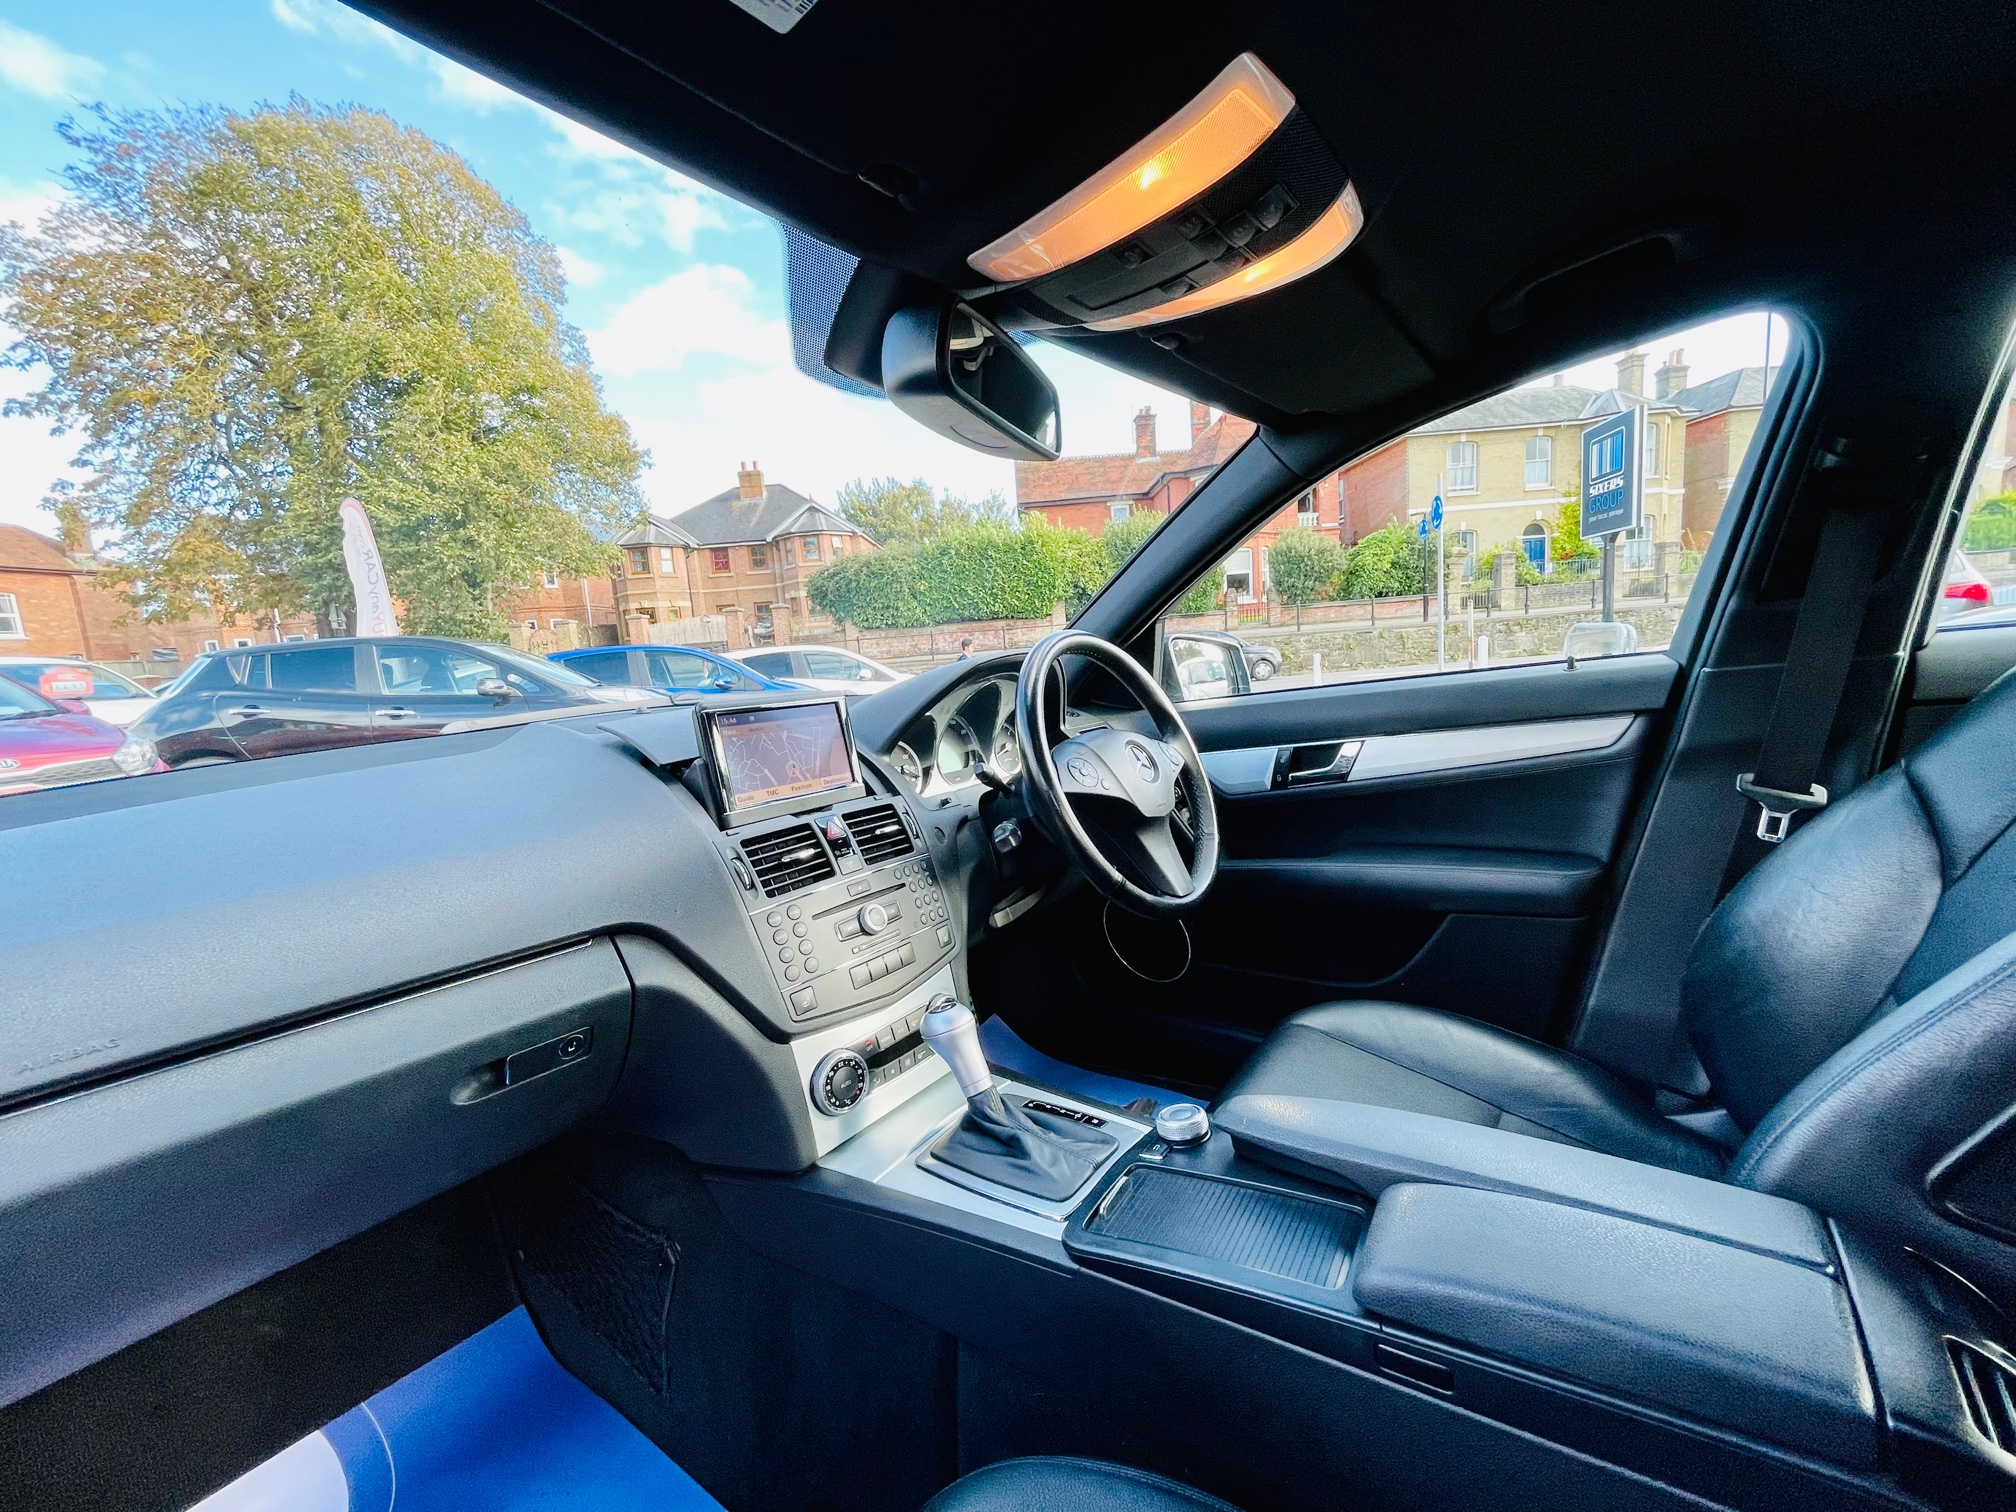 Car For Sale Mercedes C-Class - KP58ZHH Sixers Group Image #7